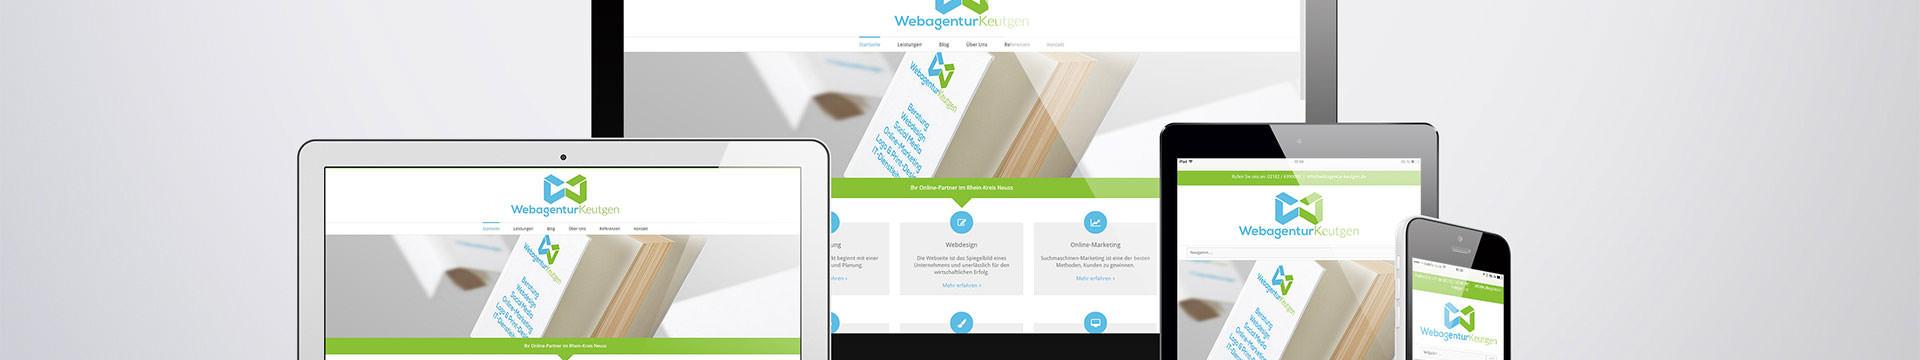 slider-webdesign-responsive-webagentur-keutgen